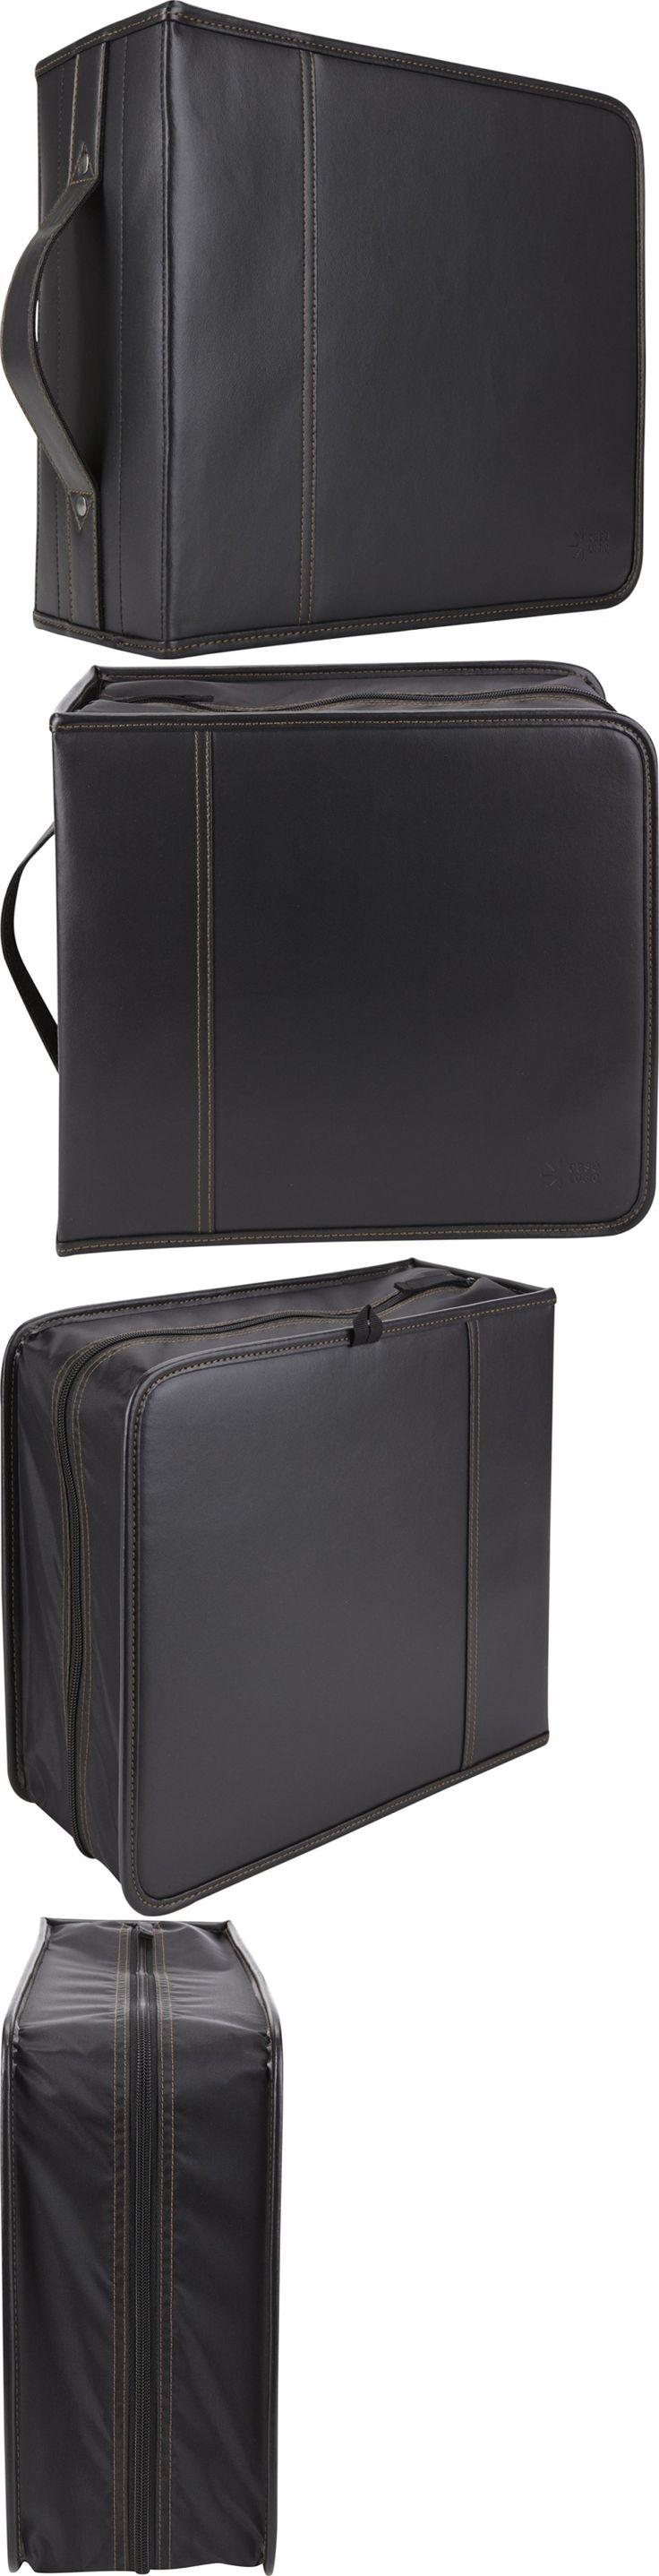 Media Cases and Storage: Case Logic Ksw-320 Koskin 336 Capacity Cd/Dvd Prosleeves Wallet (Black) -> BUY IT NOW ONLY: $33.73 on eBay!